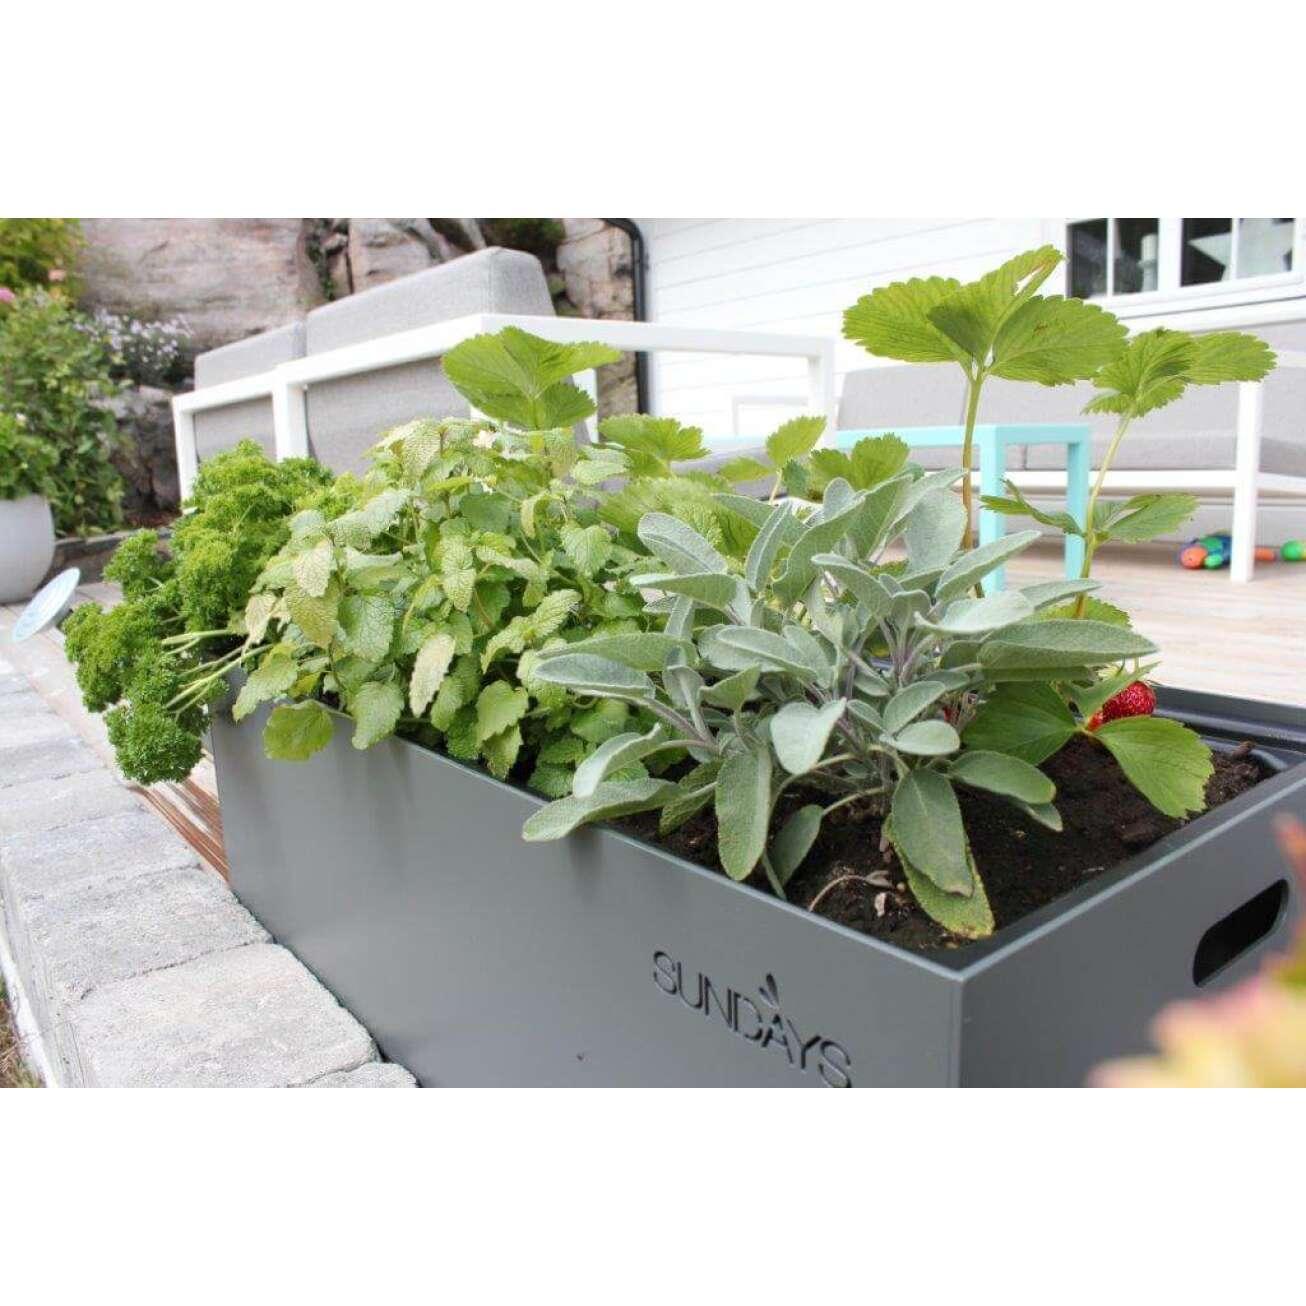 Sundays Frame Planter - selvvannende utepotte i grå med grønne krydderplanter